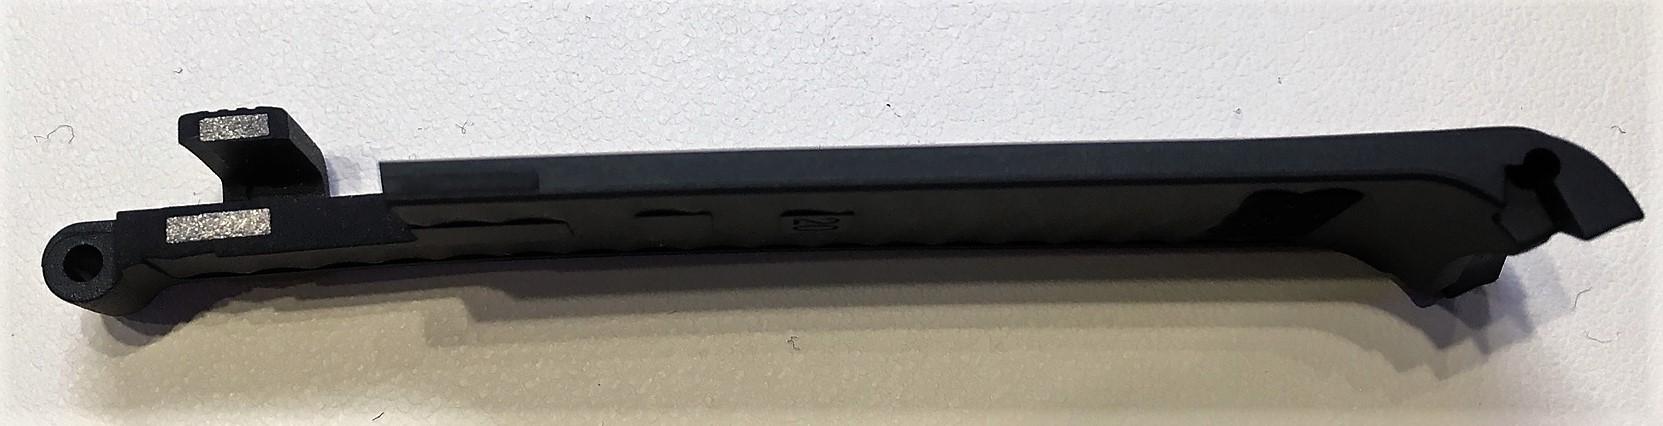 strap-with-titanium-strengthener-jpg.759